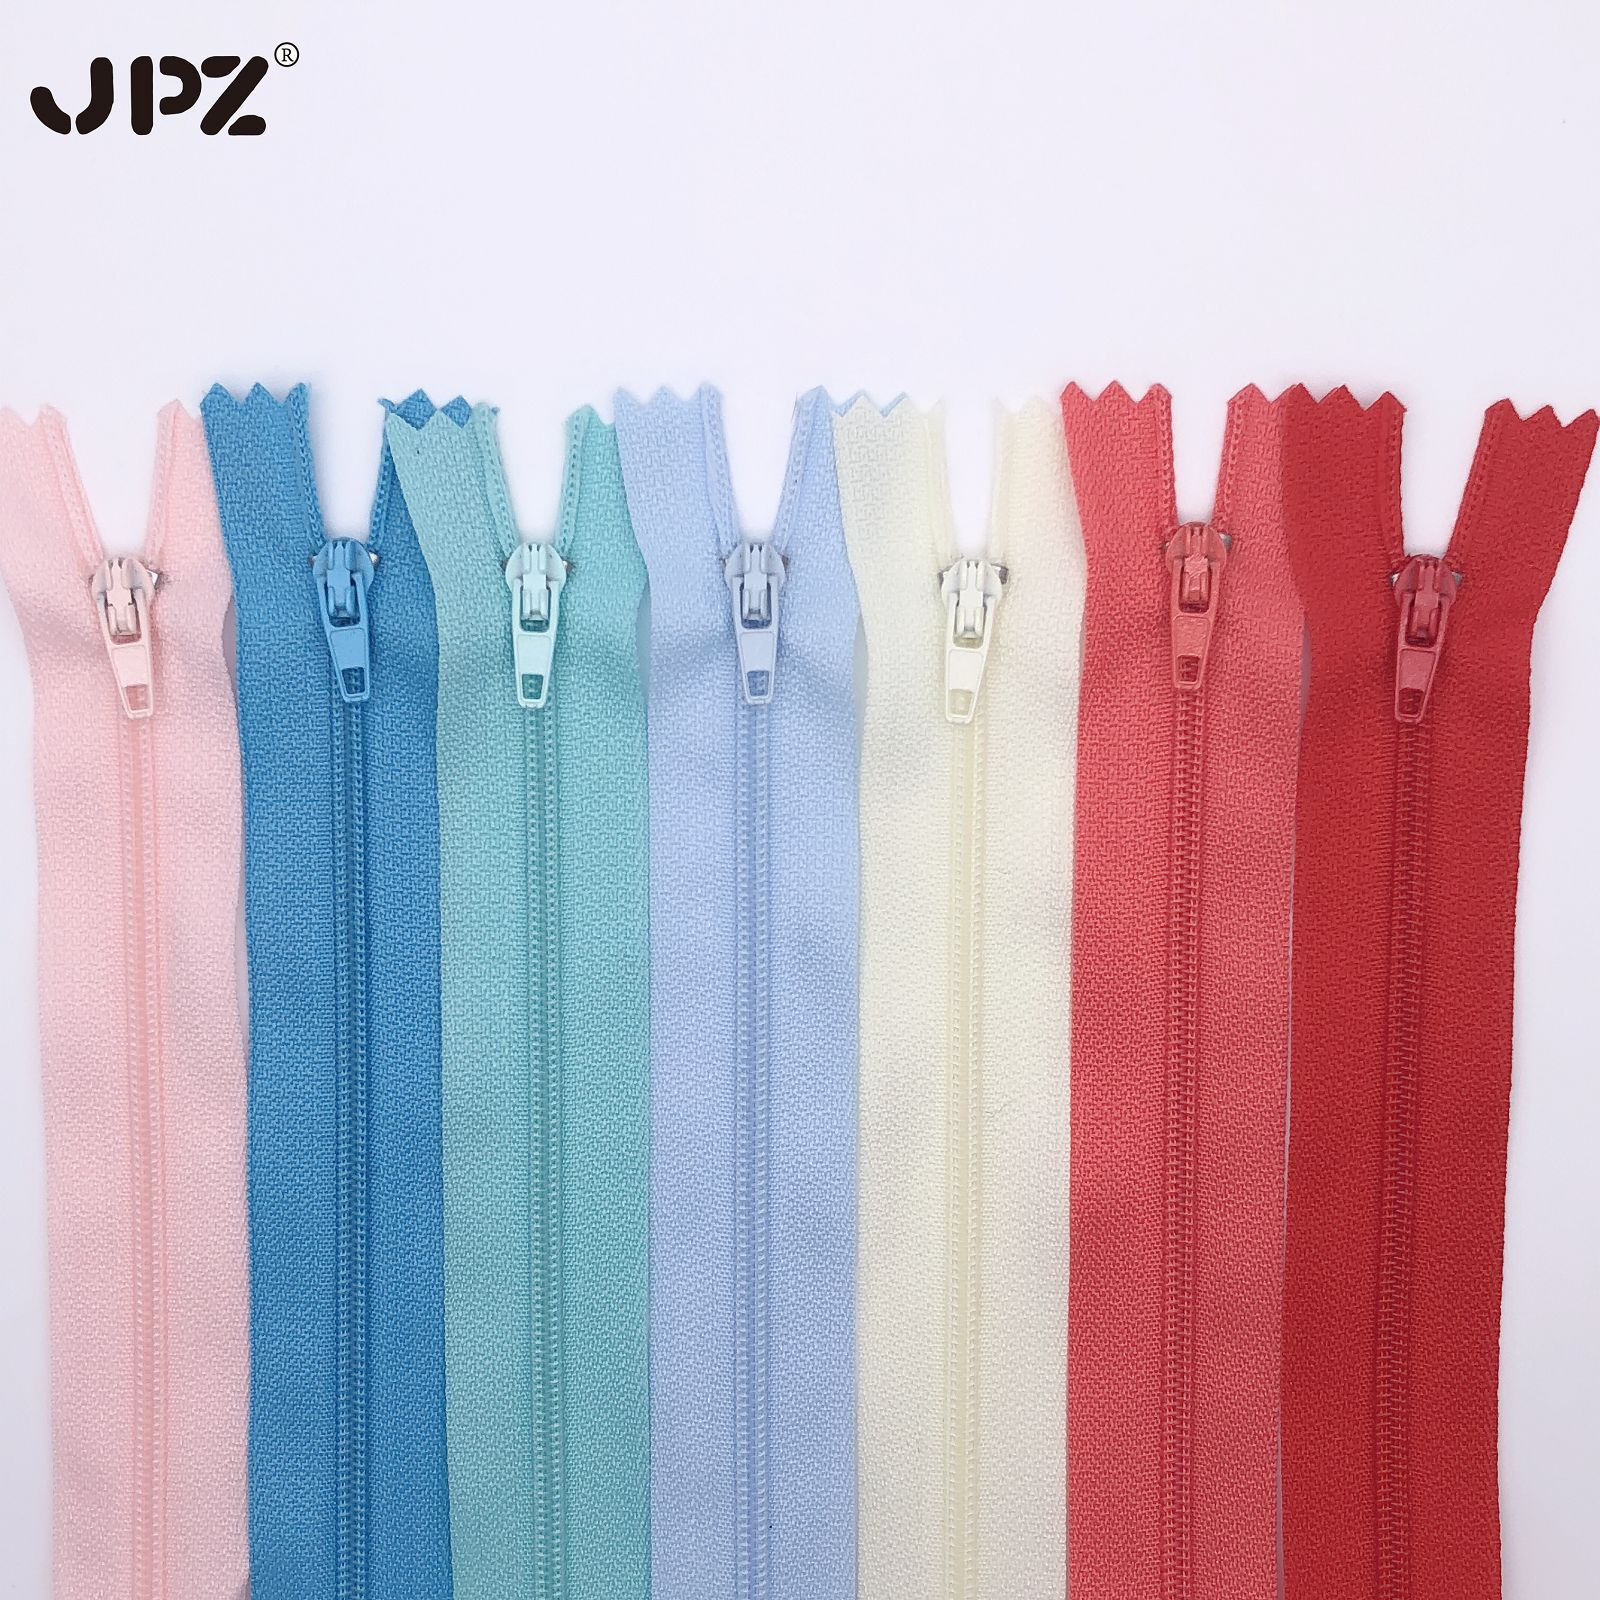 JPZ No. 3 nylon zipper color self-locking nylon closed tail pants access control clothing home texti